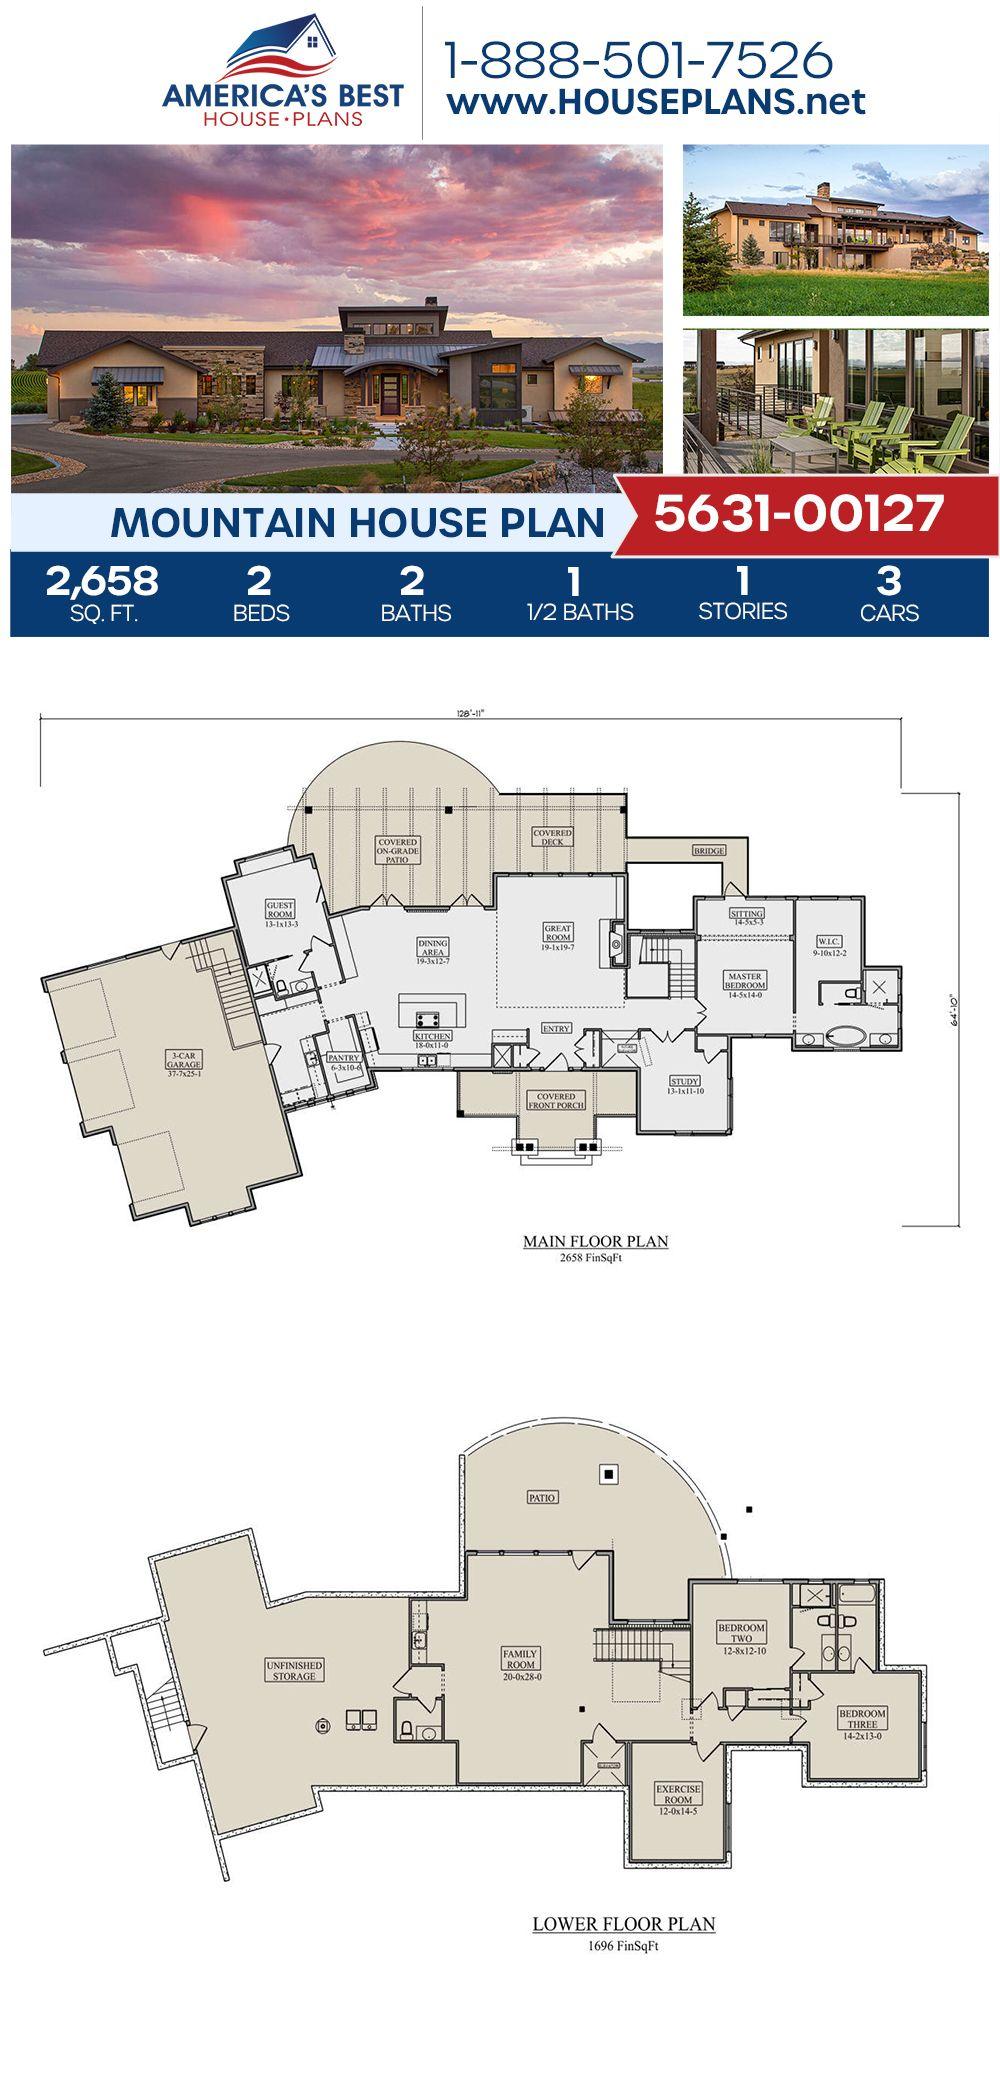 House Plan 5631 00127 Mountain Plan 2 658 Square Feet 2 Bedrooms 2 5 Bathrooms Mountain House Plans Mountain House House Plans